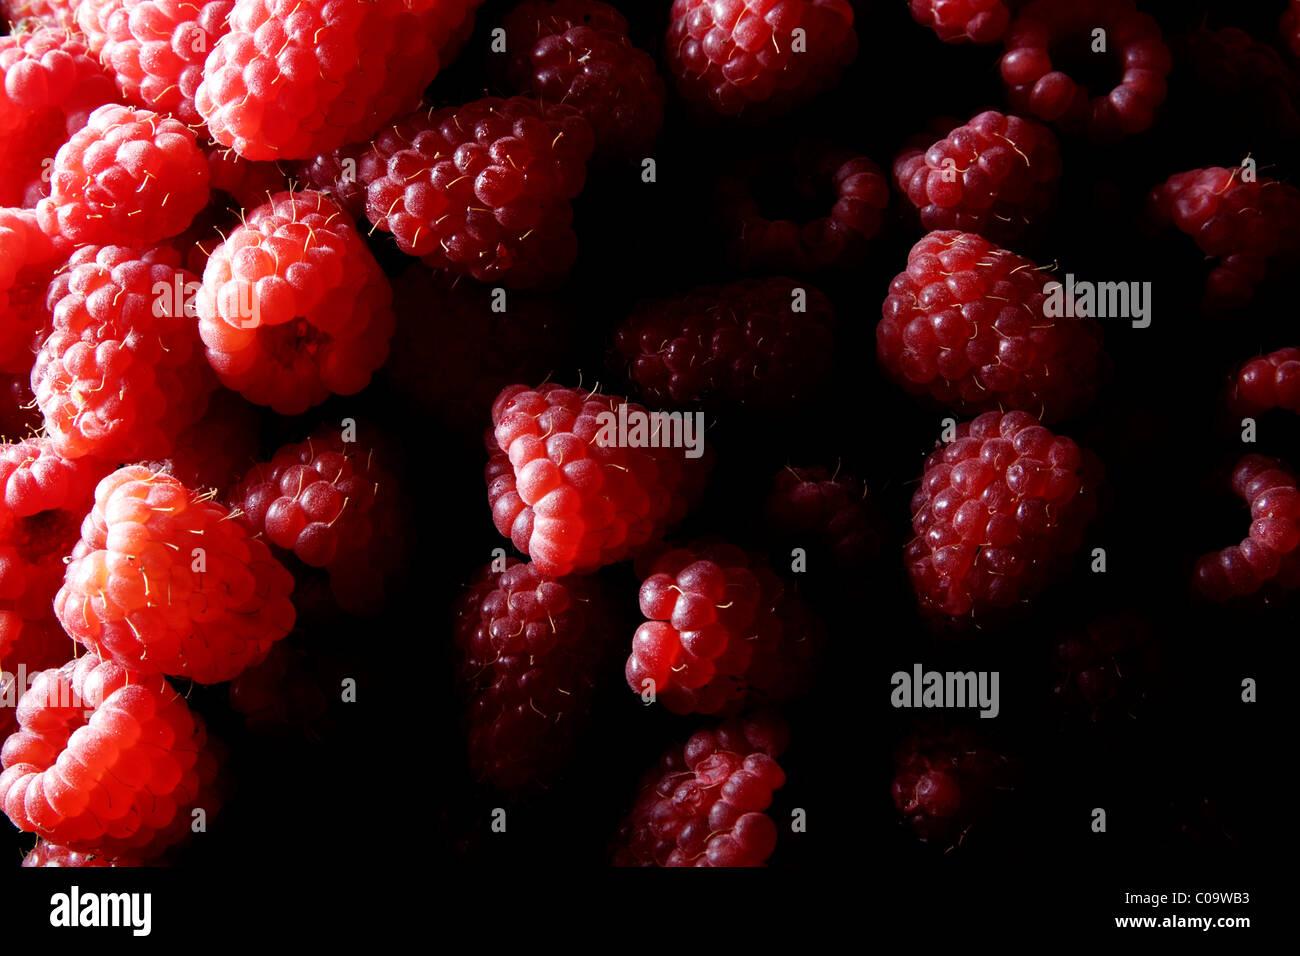 Raspberries (Rubus idaeus) - Stock Image